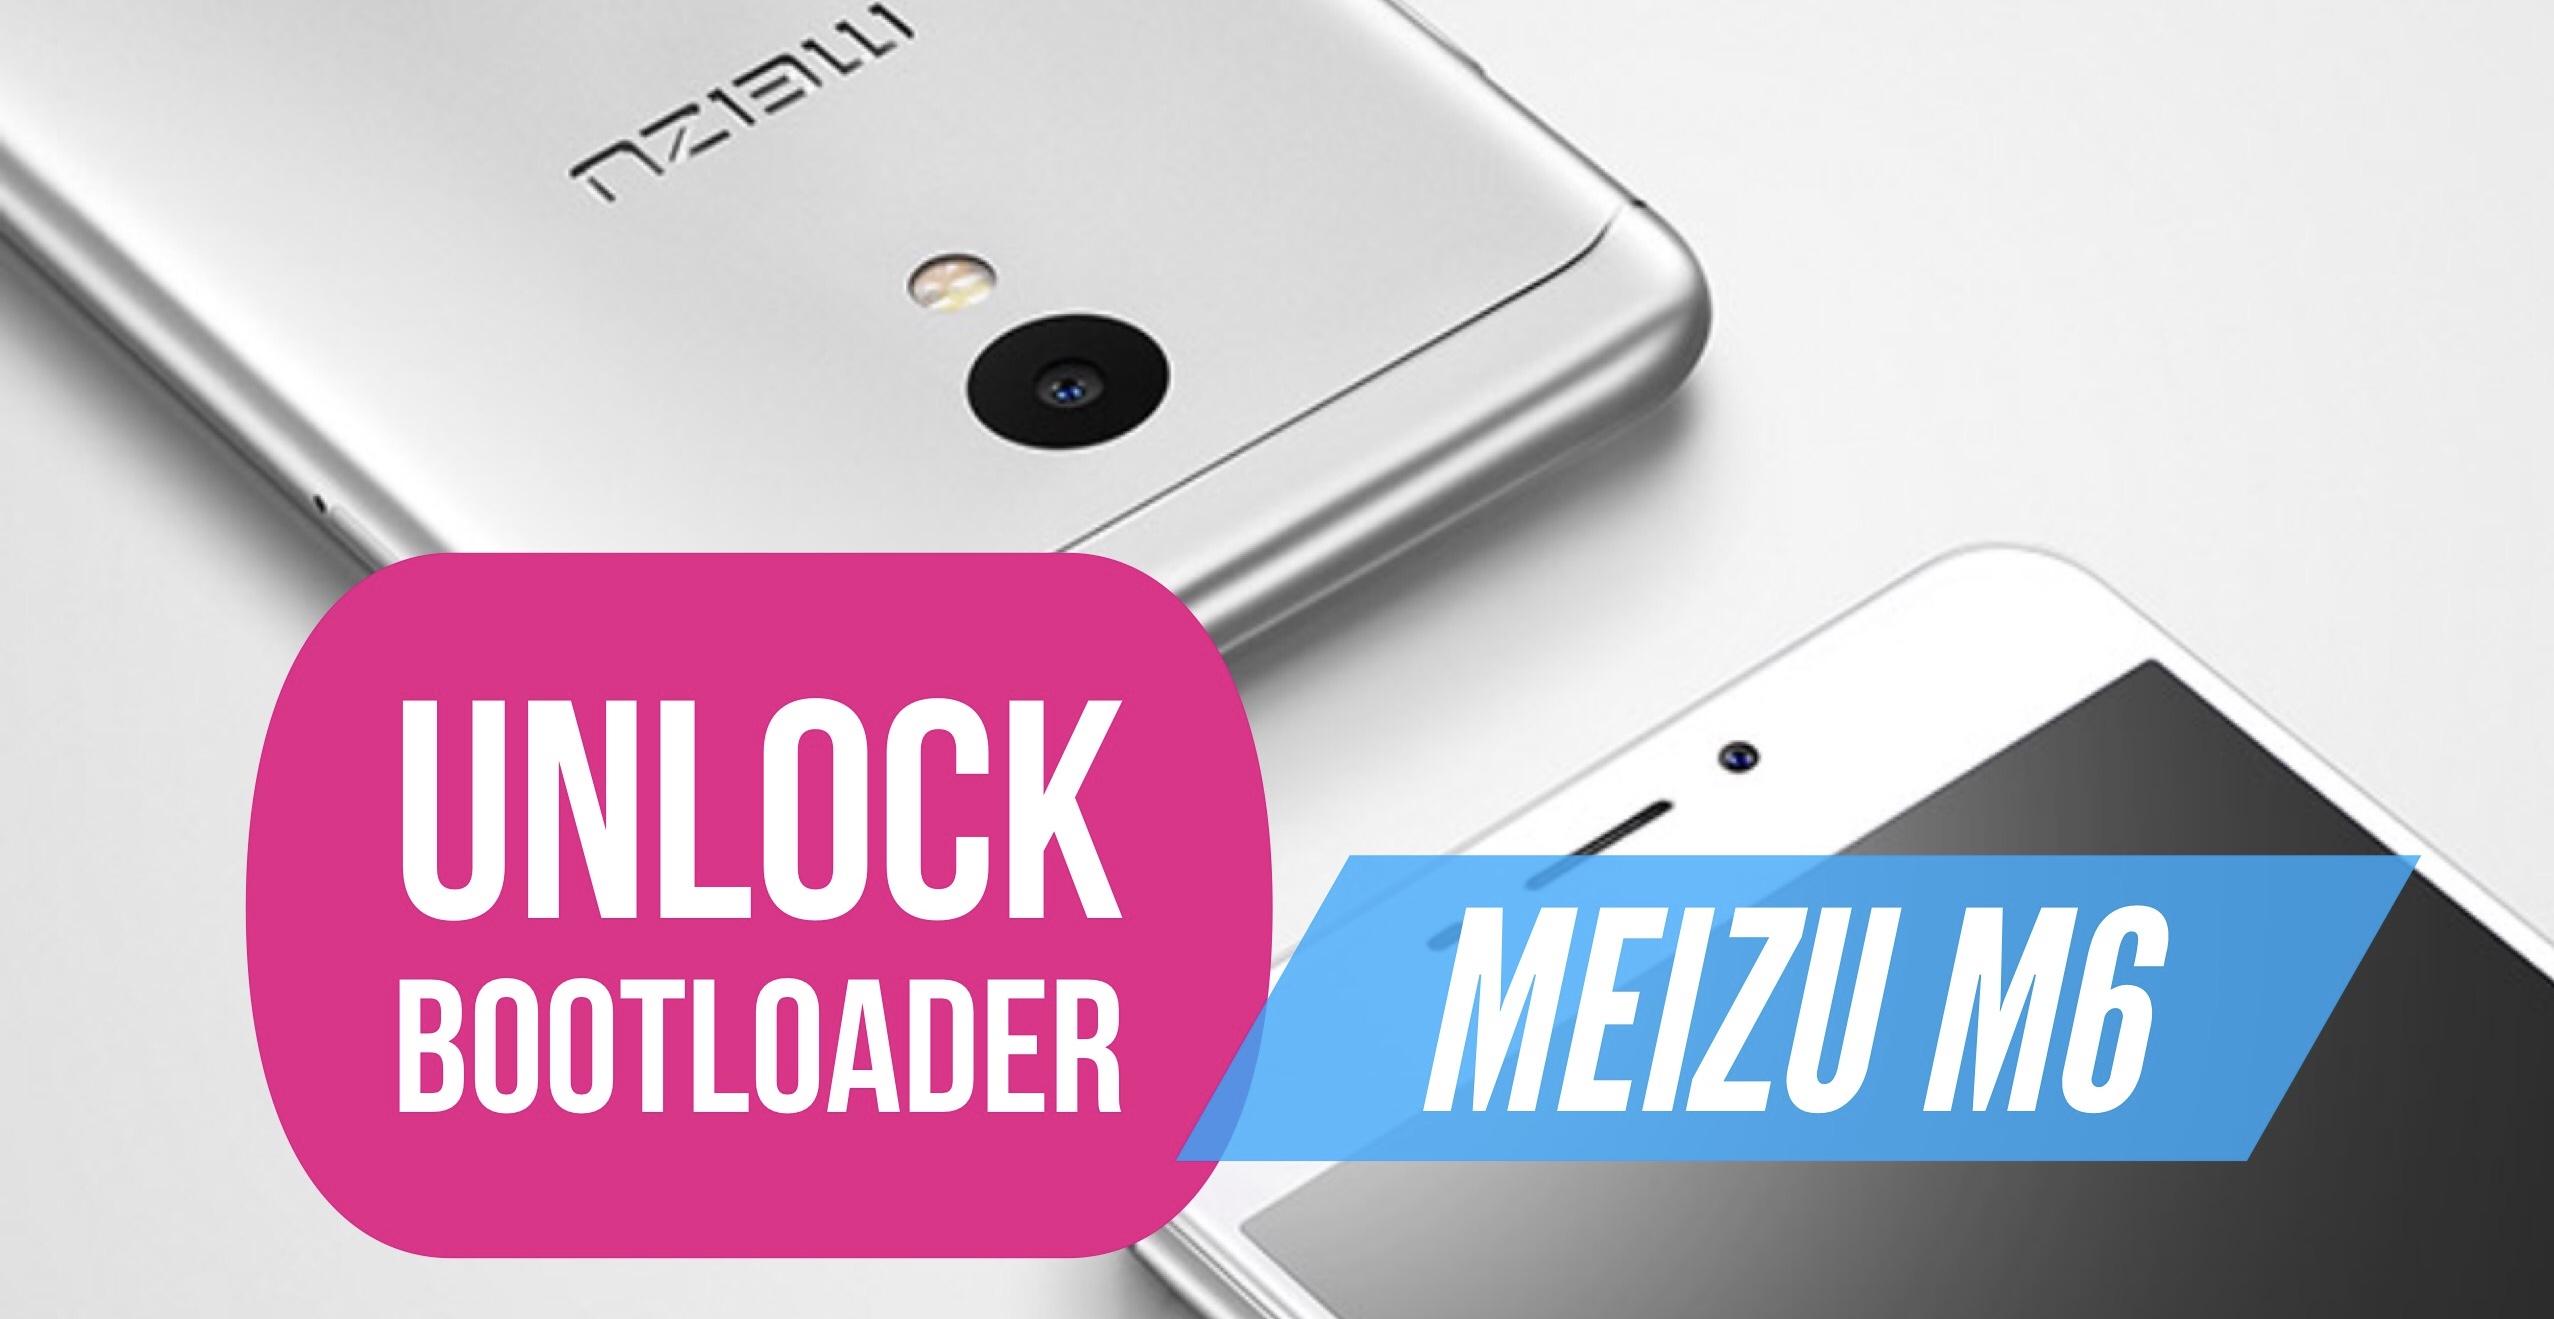 How to Unlock Bootloader on Meizu M6? Easy METHOD!